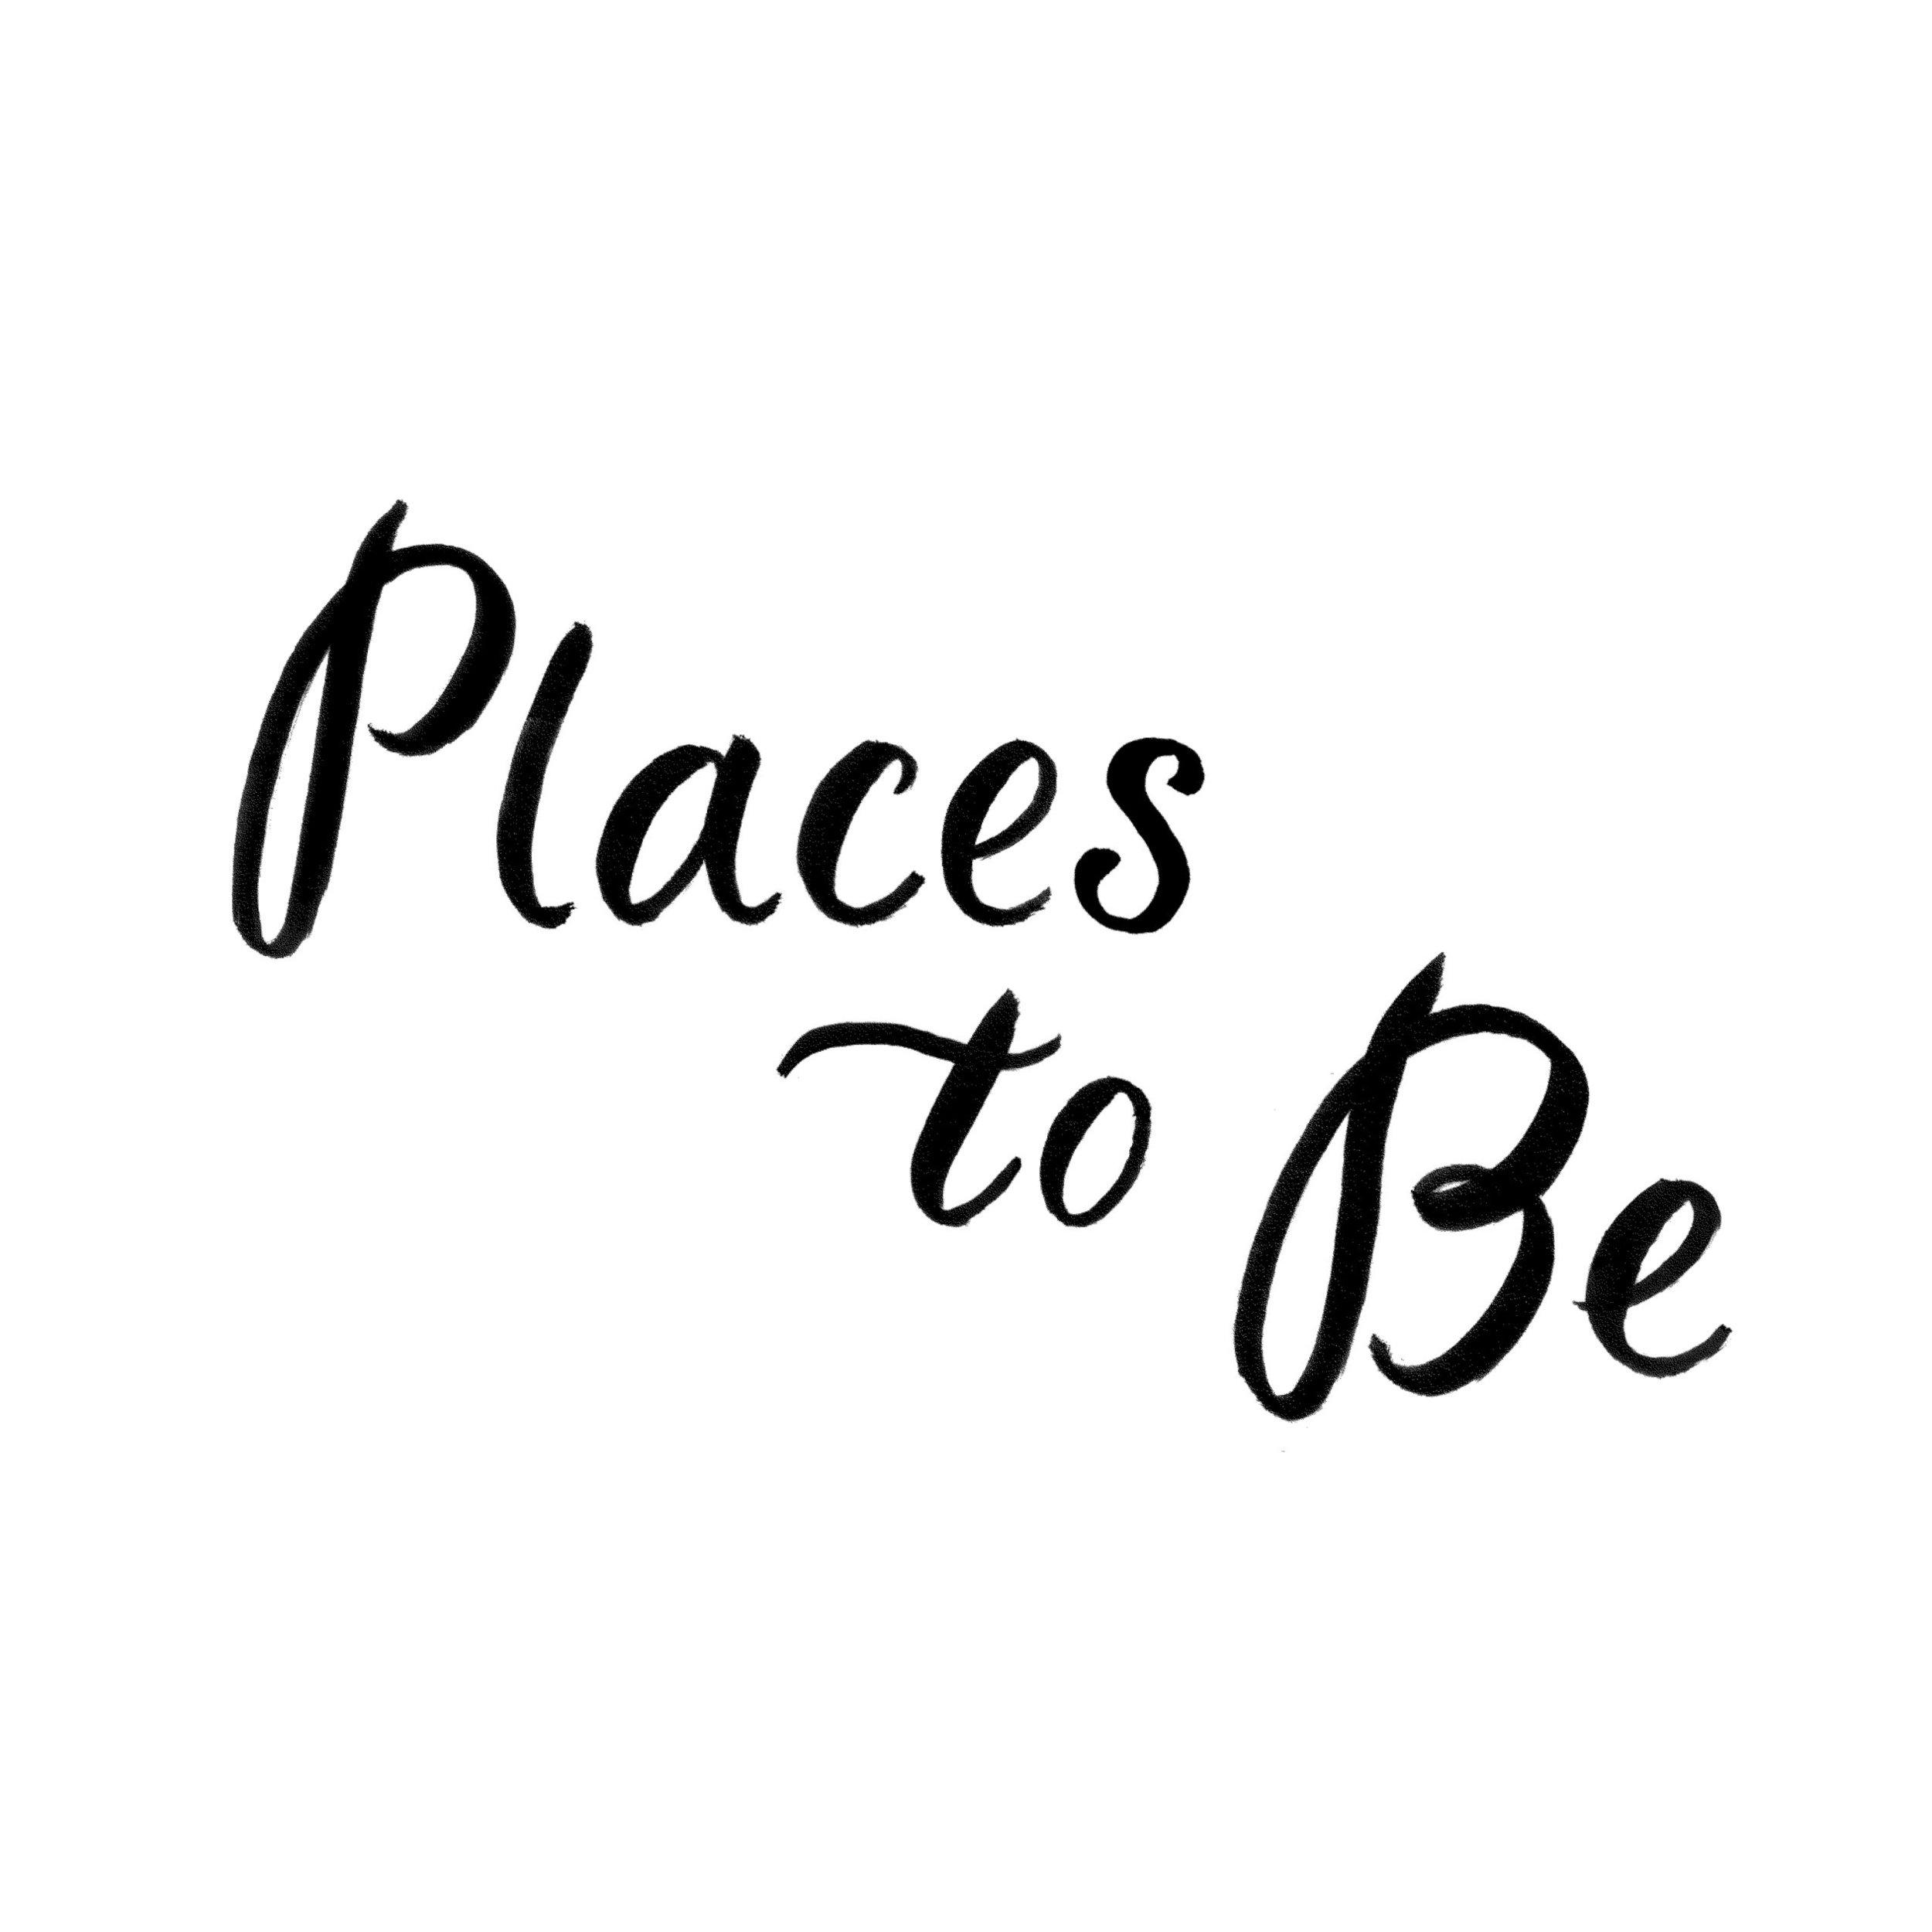 PlacesToBe+type.jpg